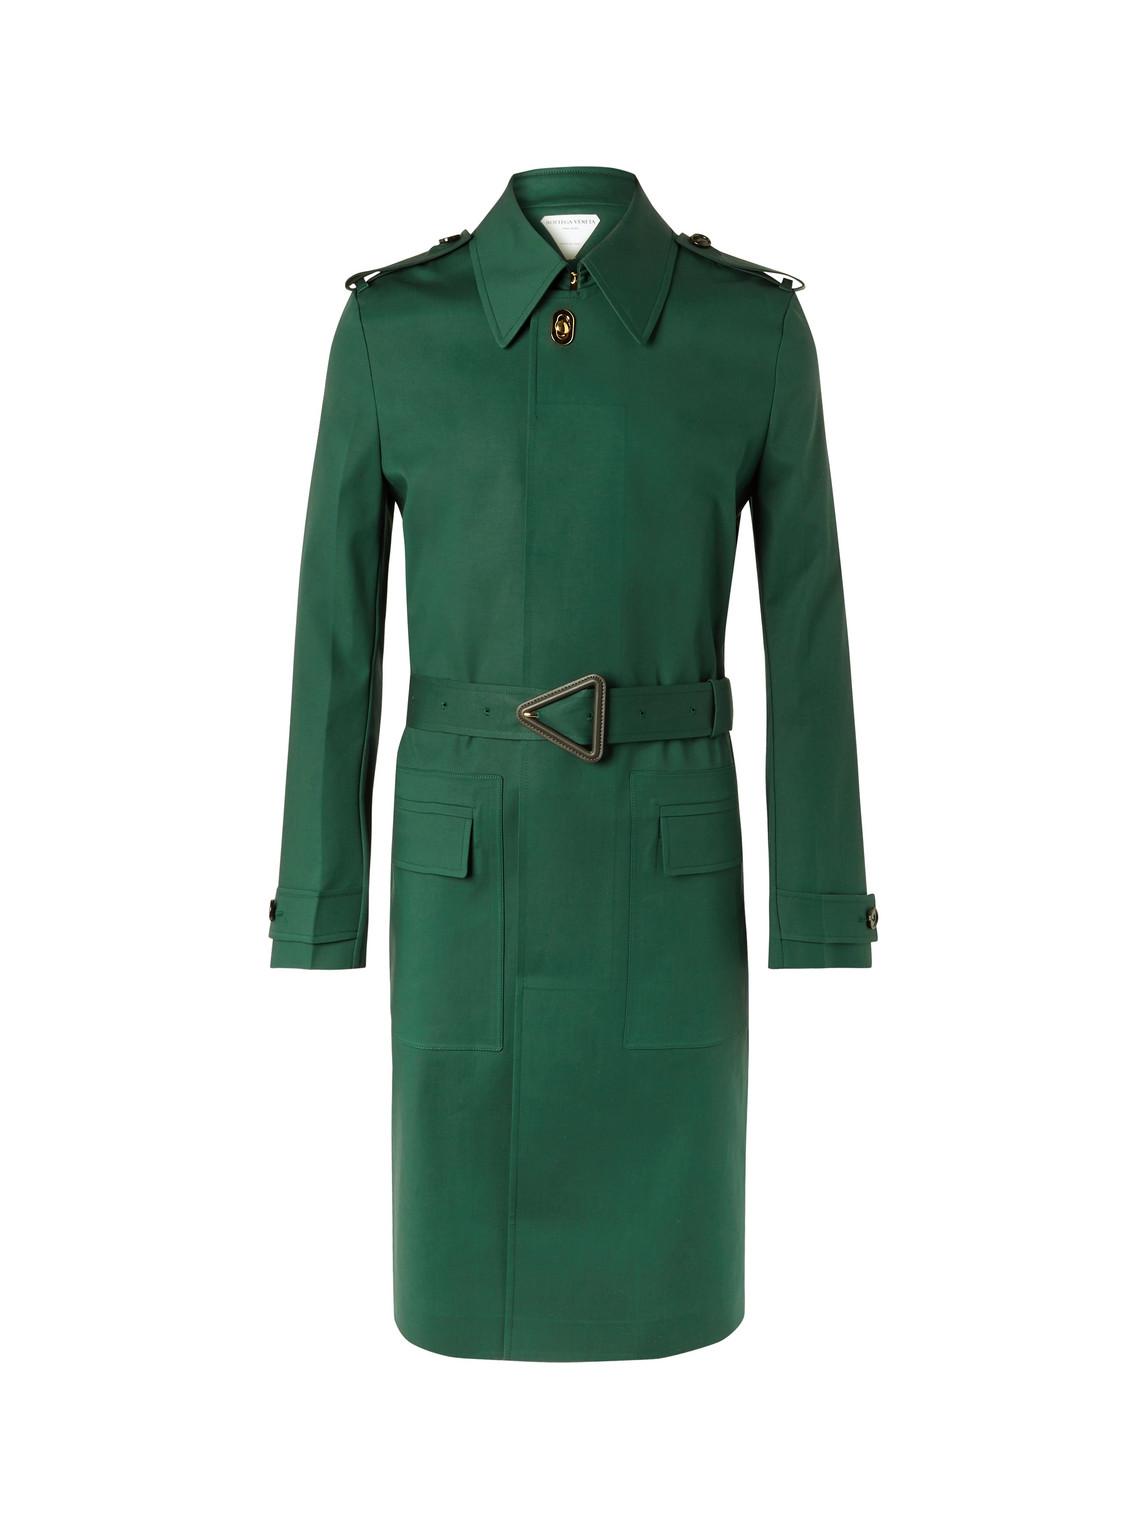 bottega veneta - cotton-blend trench coat - men - green - it 48